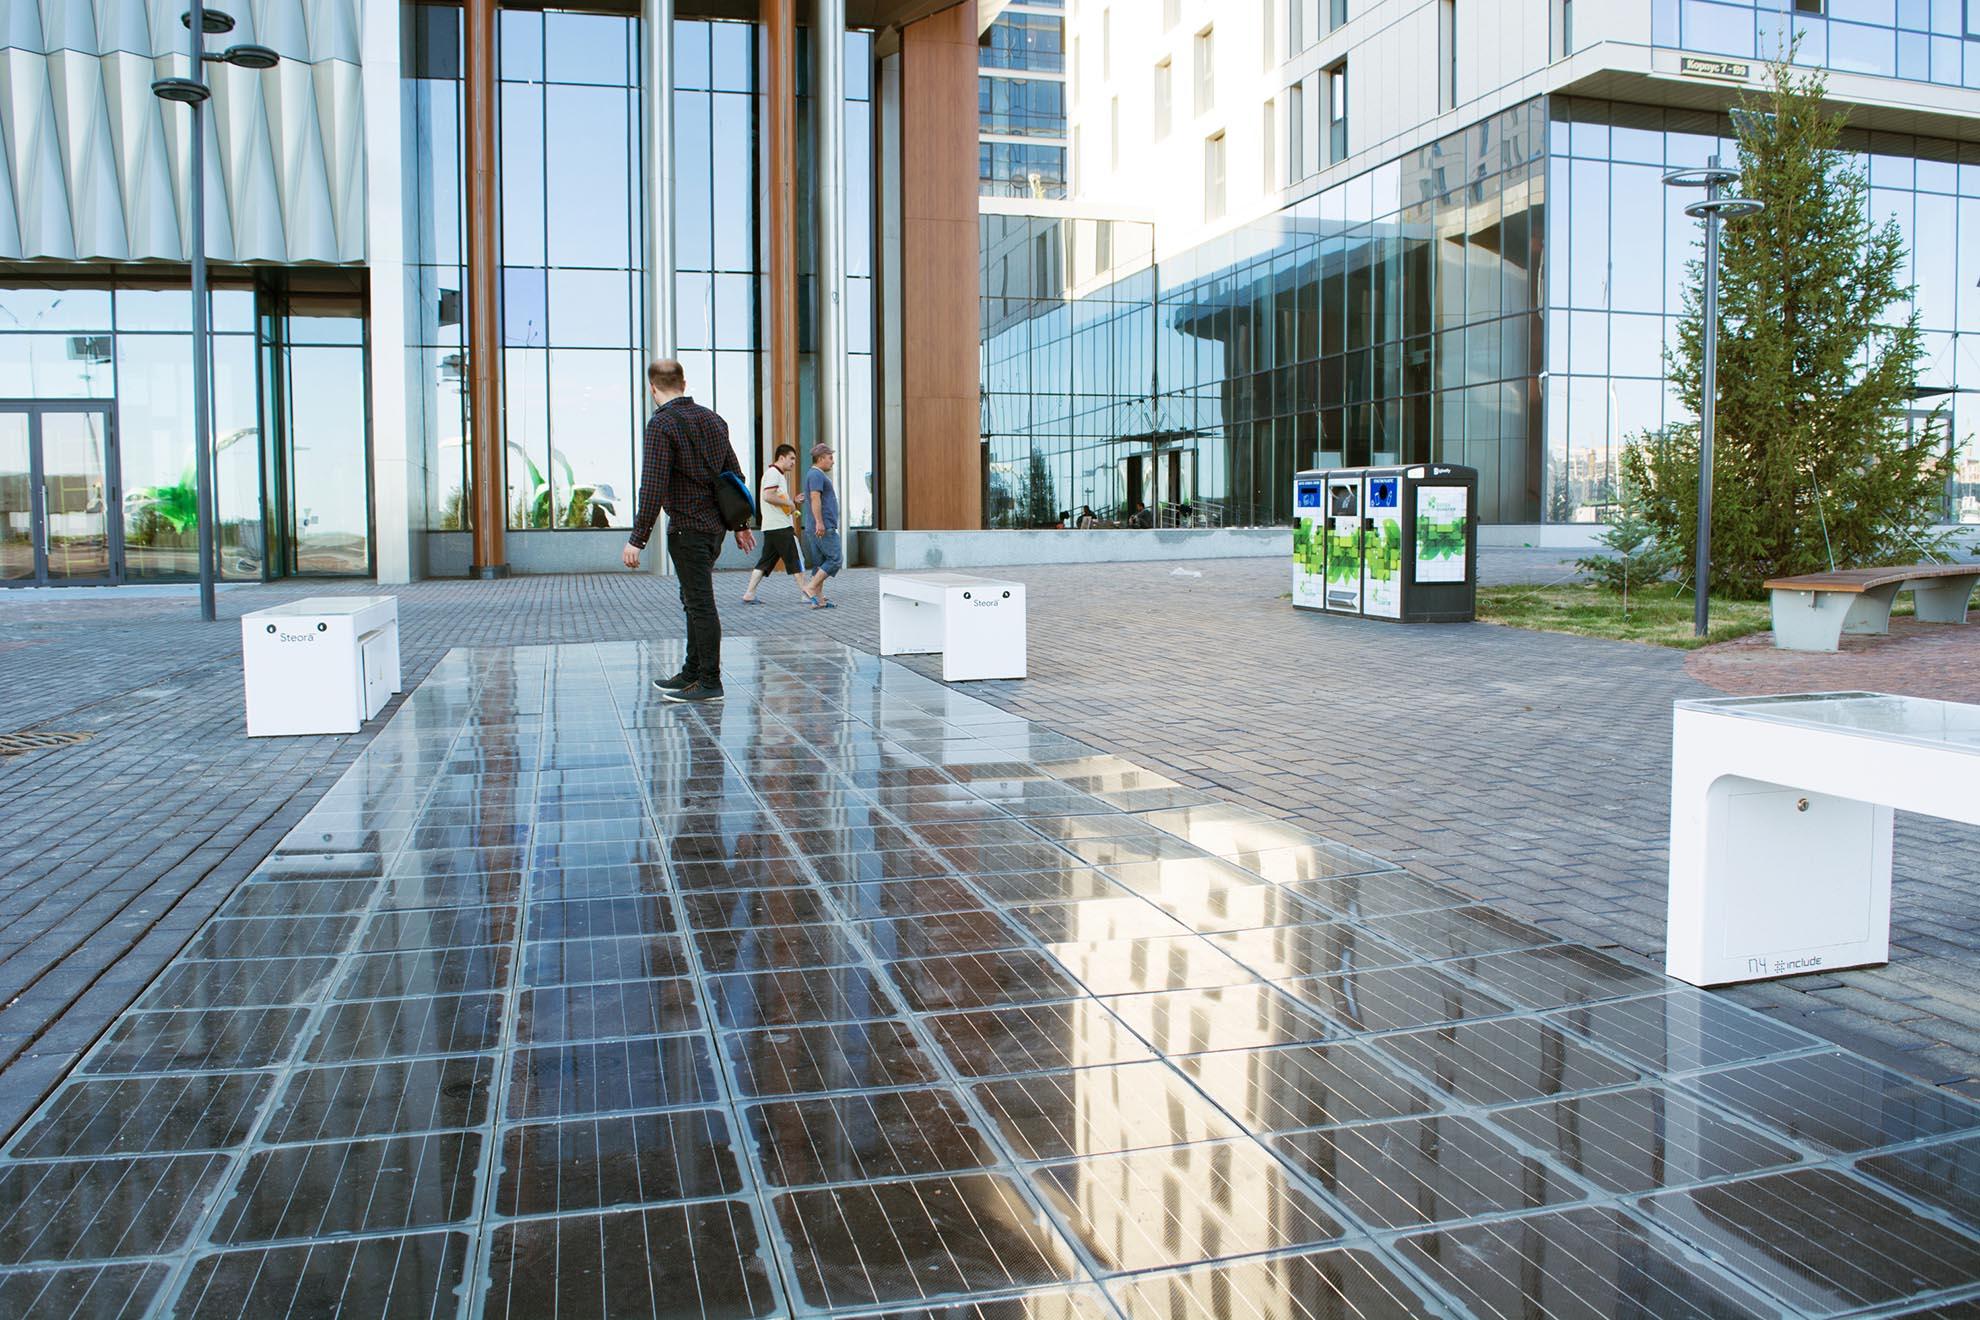 Platio Solar paving